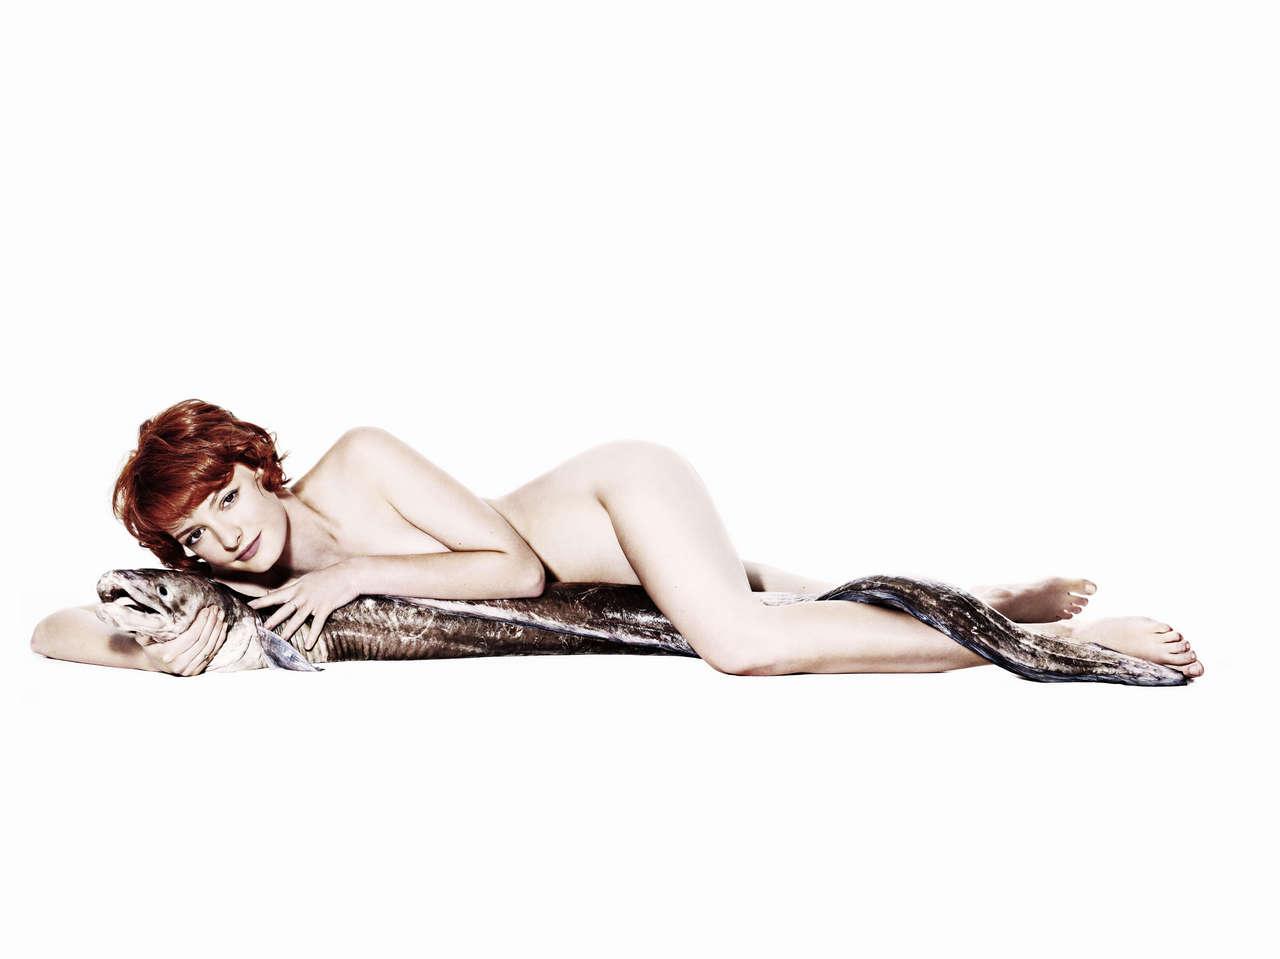 Dakota Blue Richards With A Conger Eel Naked 8980x6729 NSFW